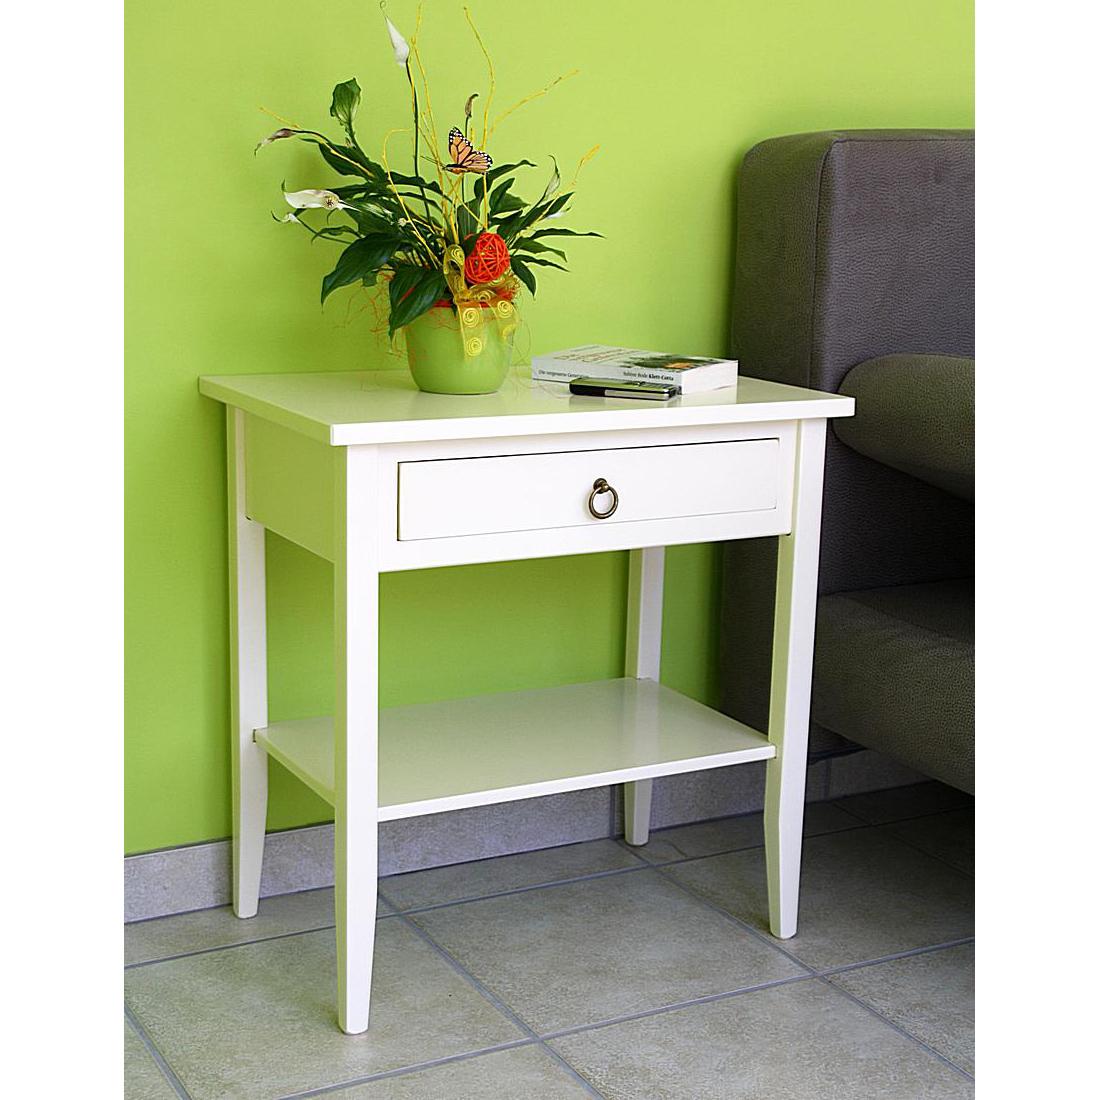 cremefarbene m bel vollholz italienische m bel von casa de mobila. Black Bedroom Furniture Sets. Home Design Ideas